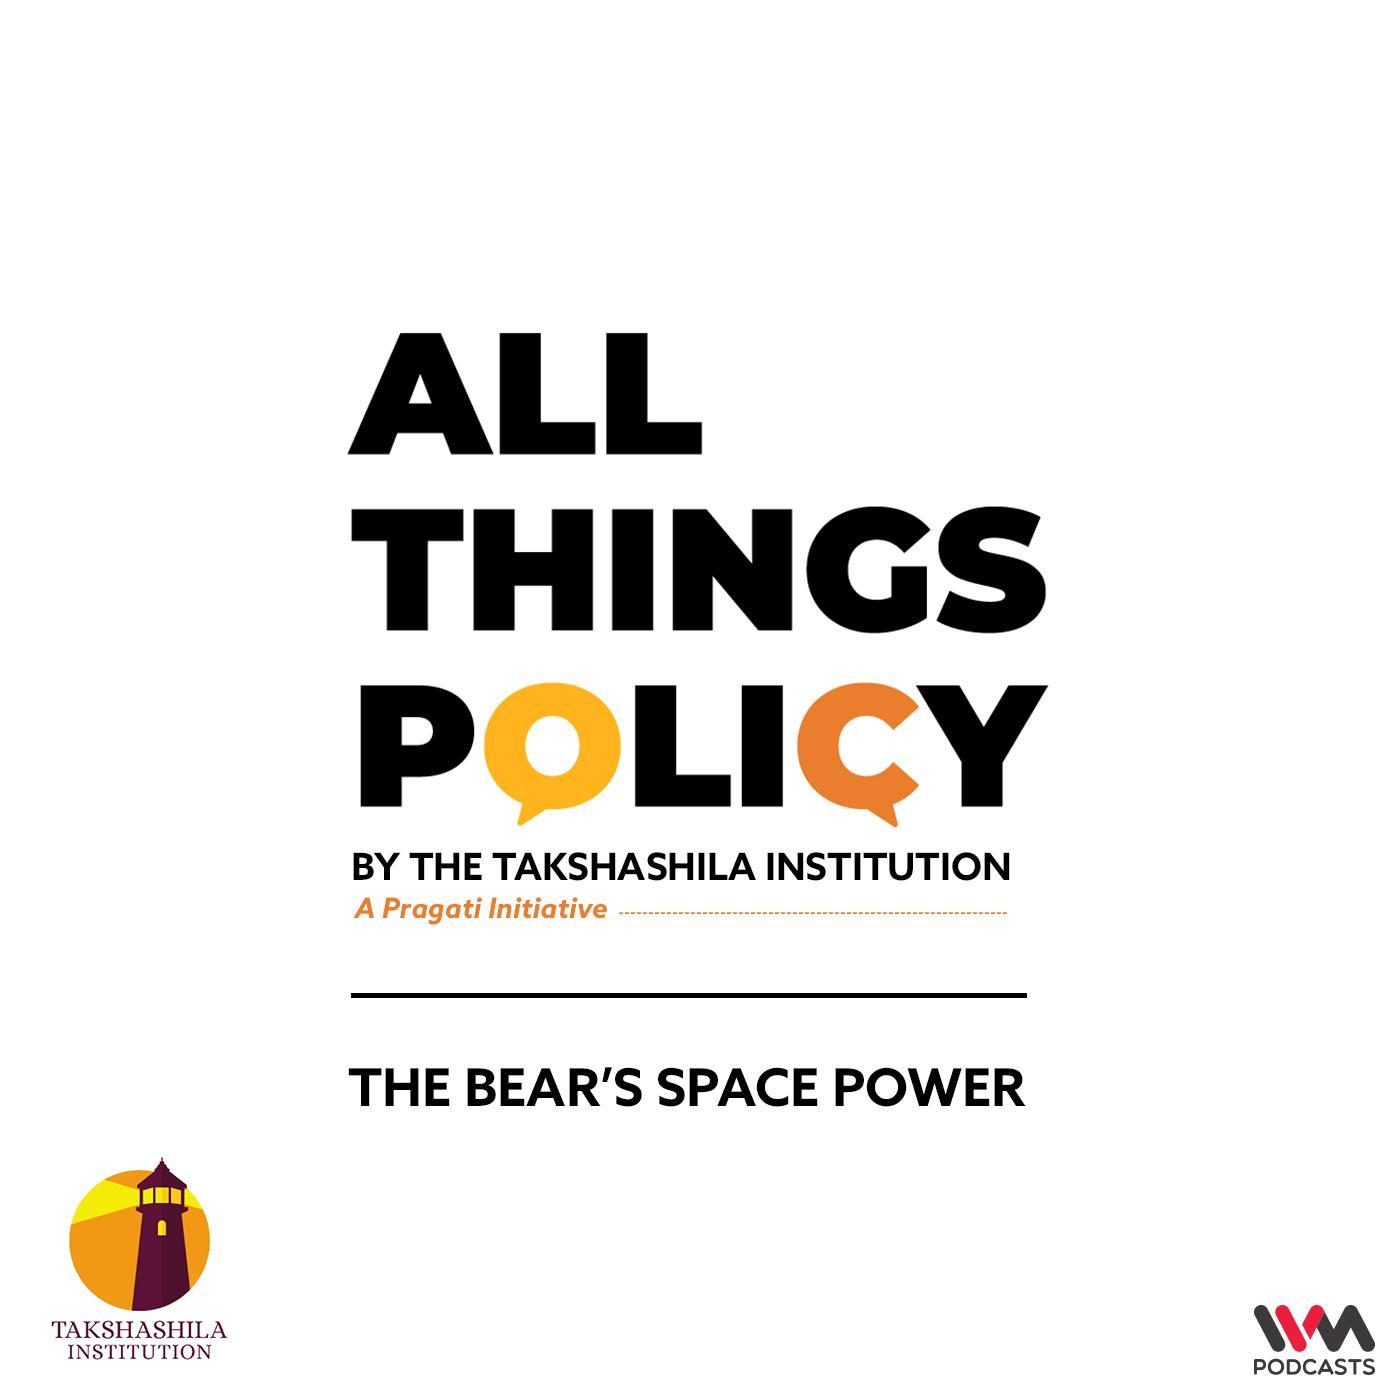 The Bear's Space Power